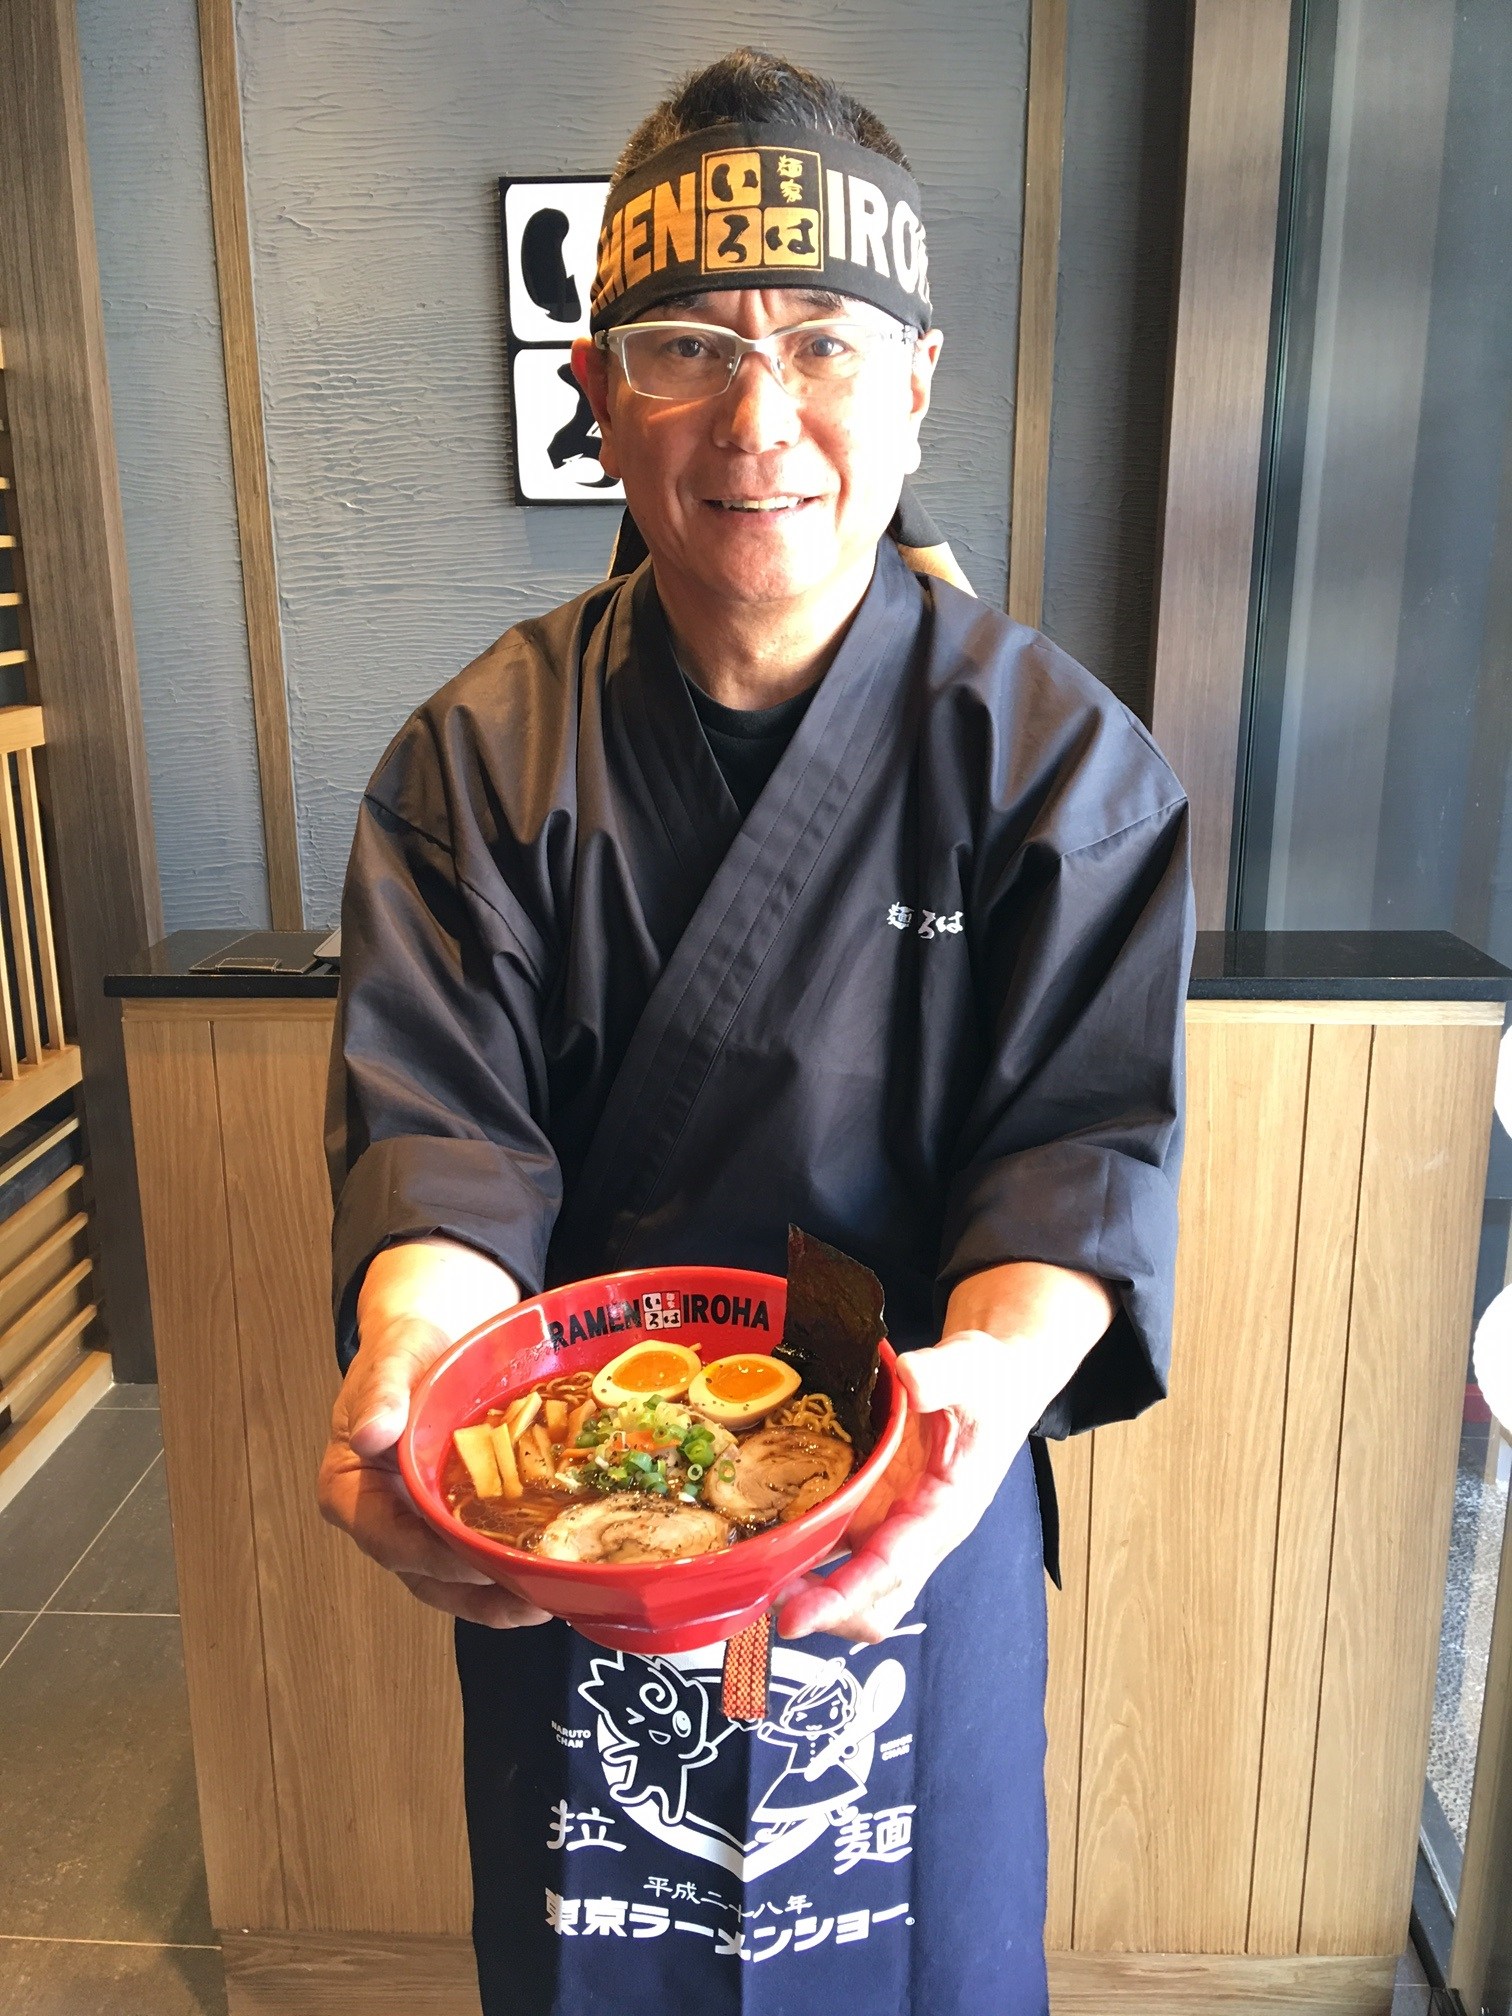 Japanese winning ramen operator expands to Taiwan with 'zero-additive' ramen